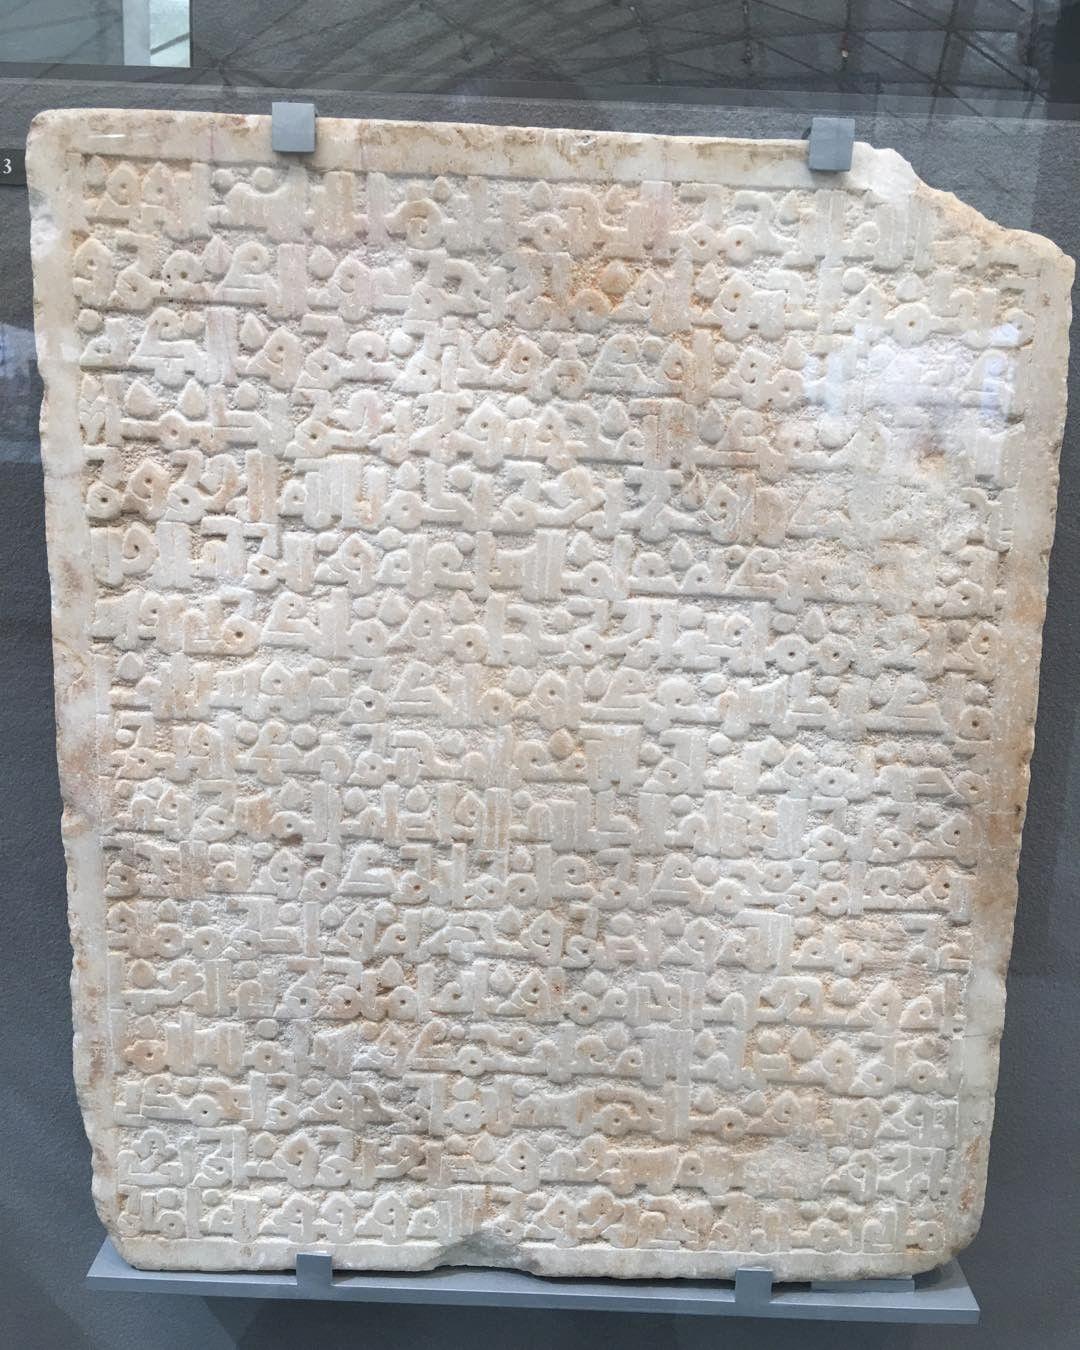 Khat Diwani Ajhalawani/Amr شاهد قبر منحوت على الرخام، وجد في مصر في القرن الخامس من الهجرة. #متحف_اللوفر #ب… 30